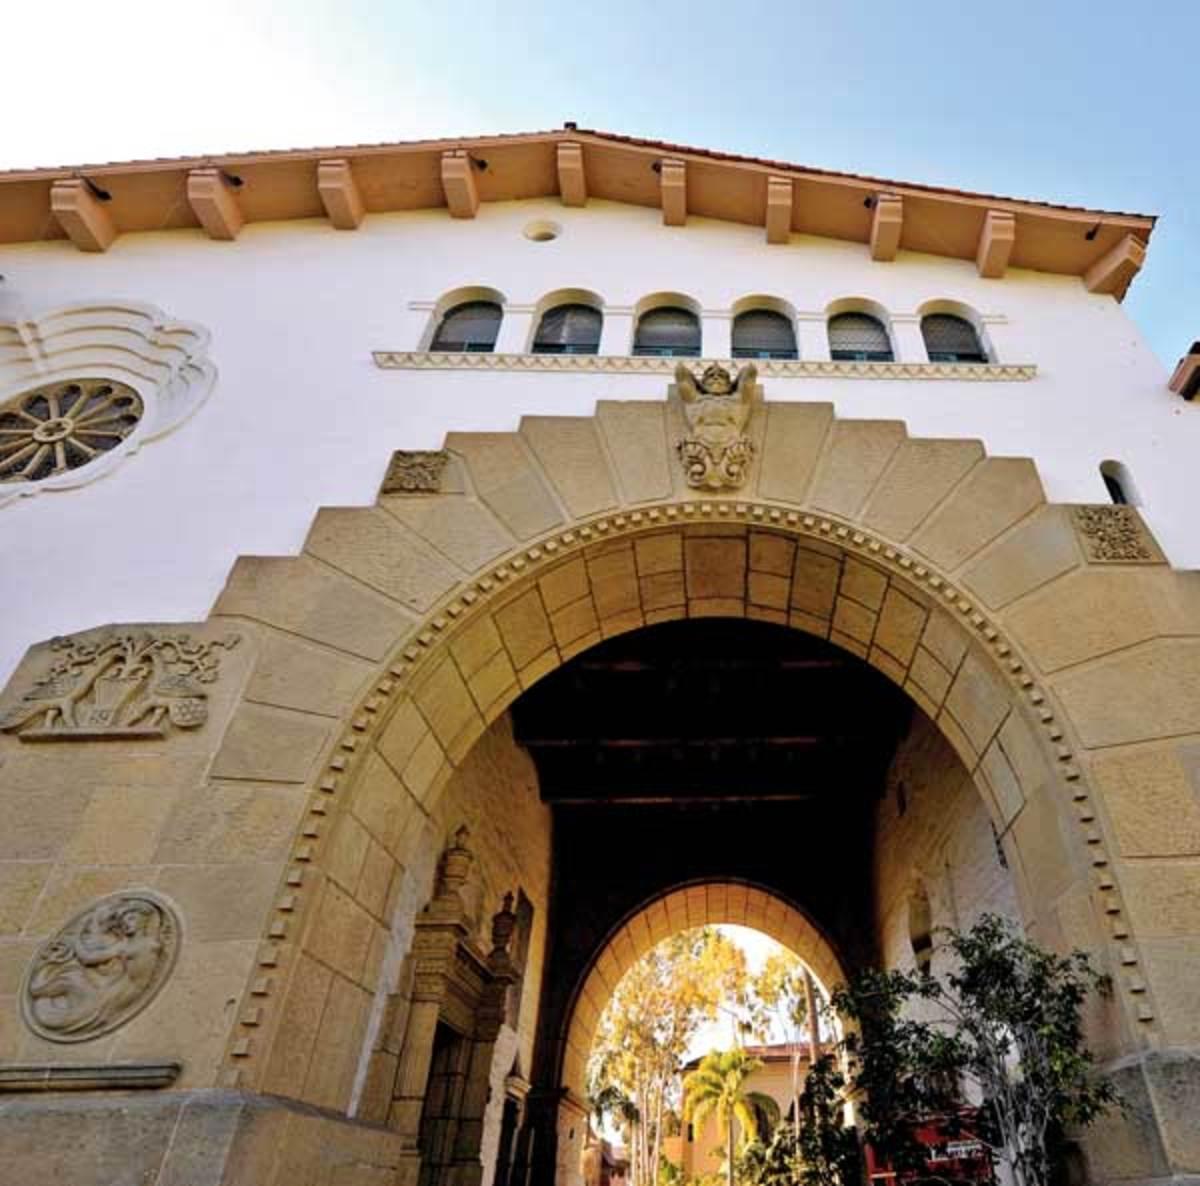 Santa Barbara Courthouse arch, Arts & Crafts movement in California